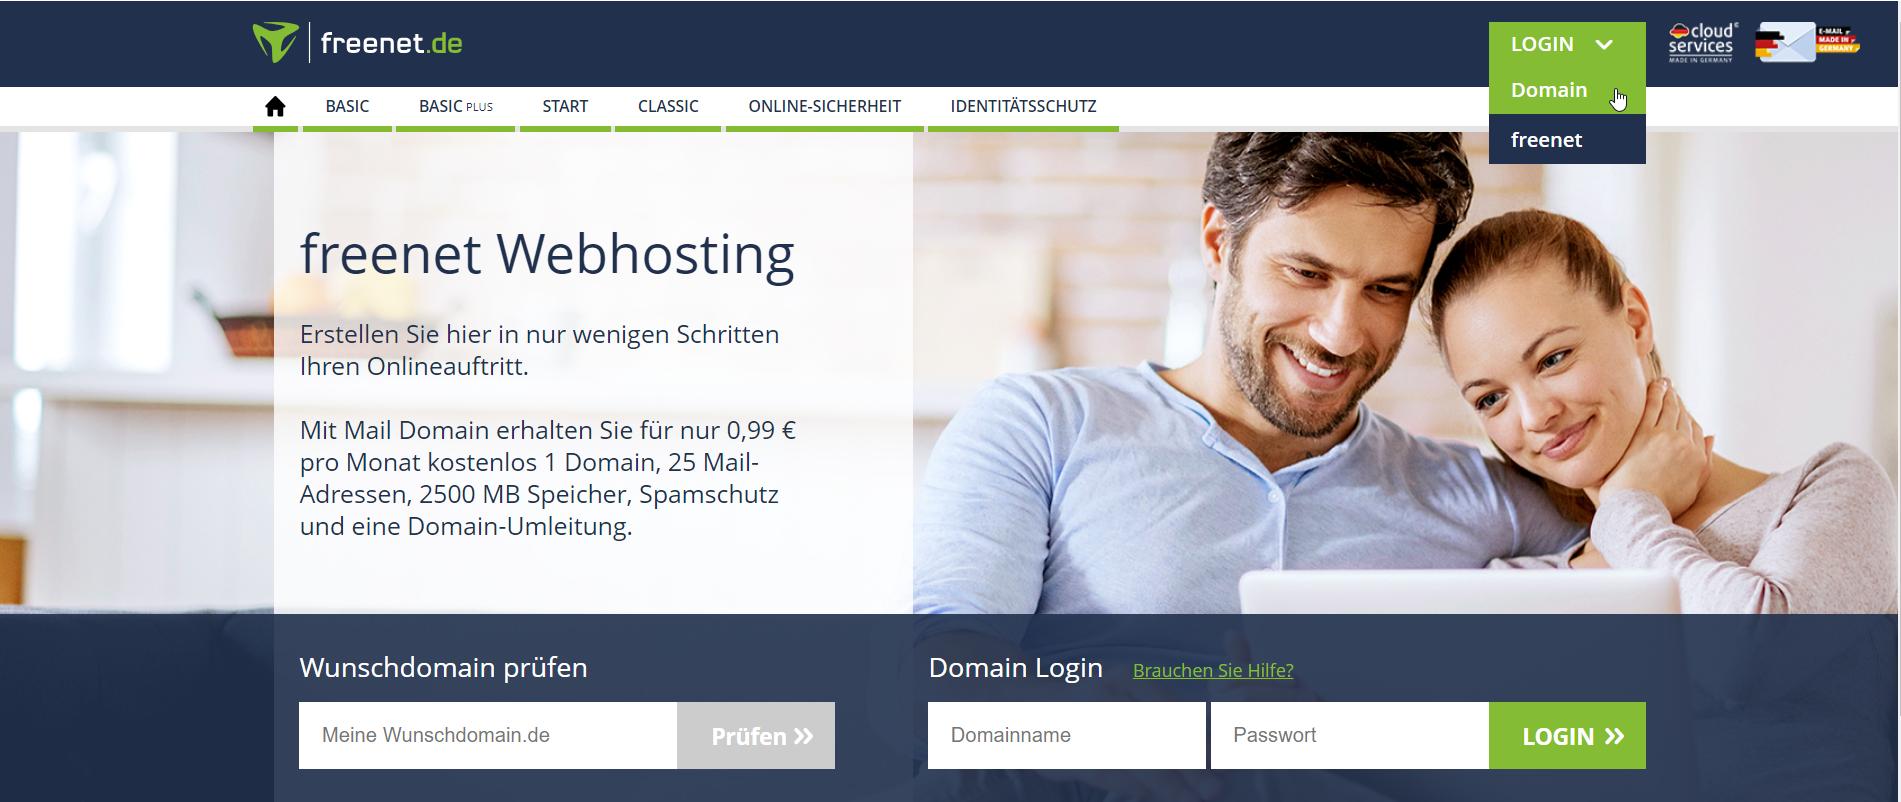 email.freenet.de_domain_index.html